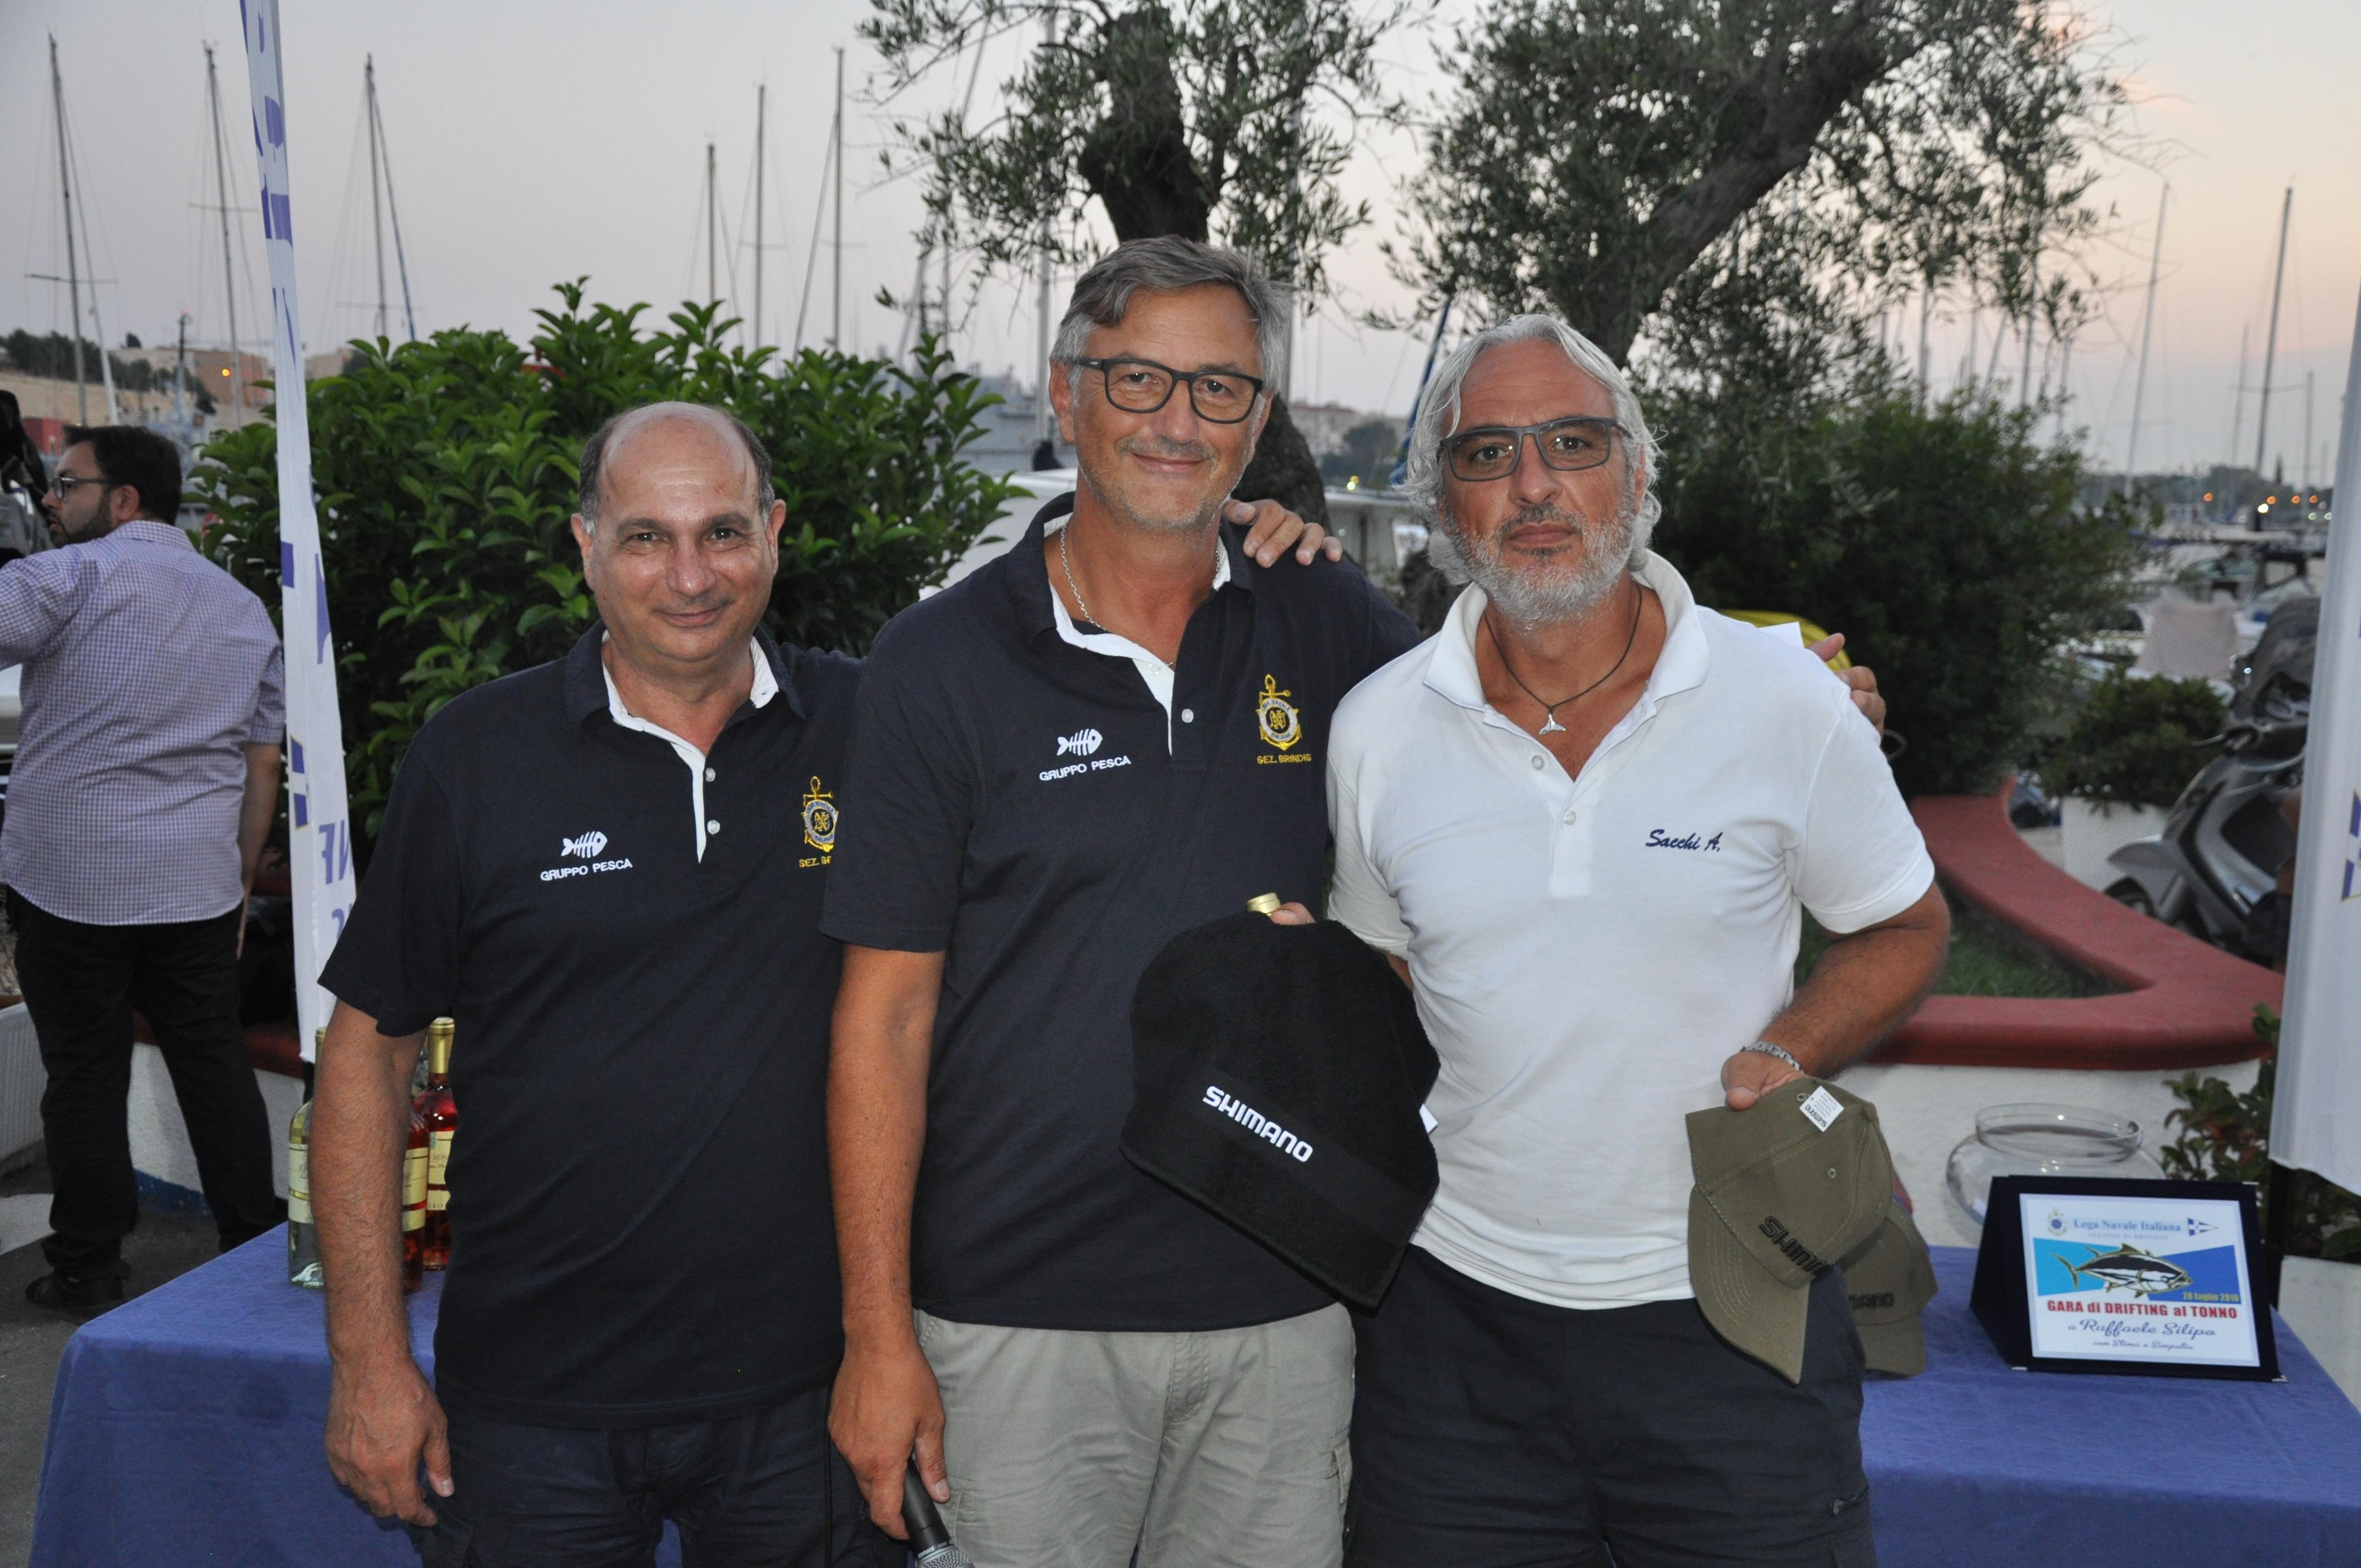 premiazione drifting al tonno 2018 (2)